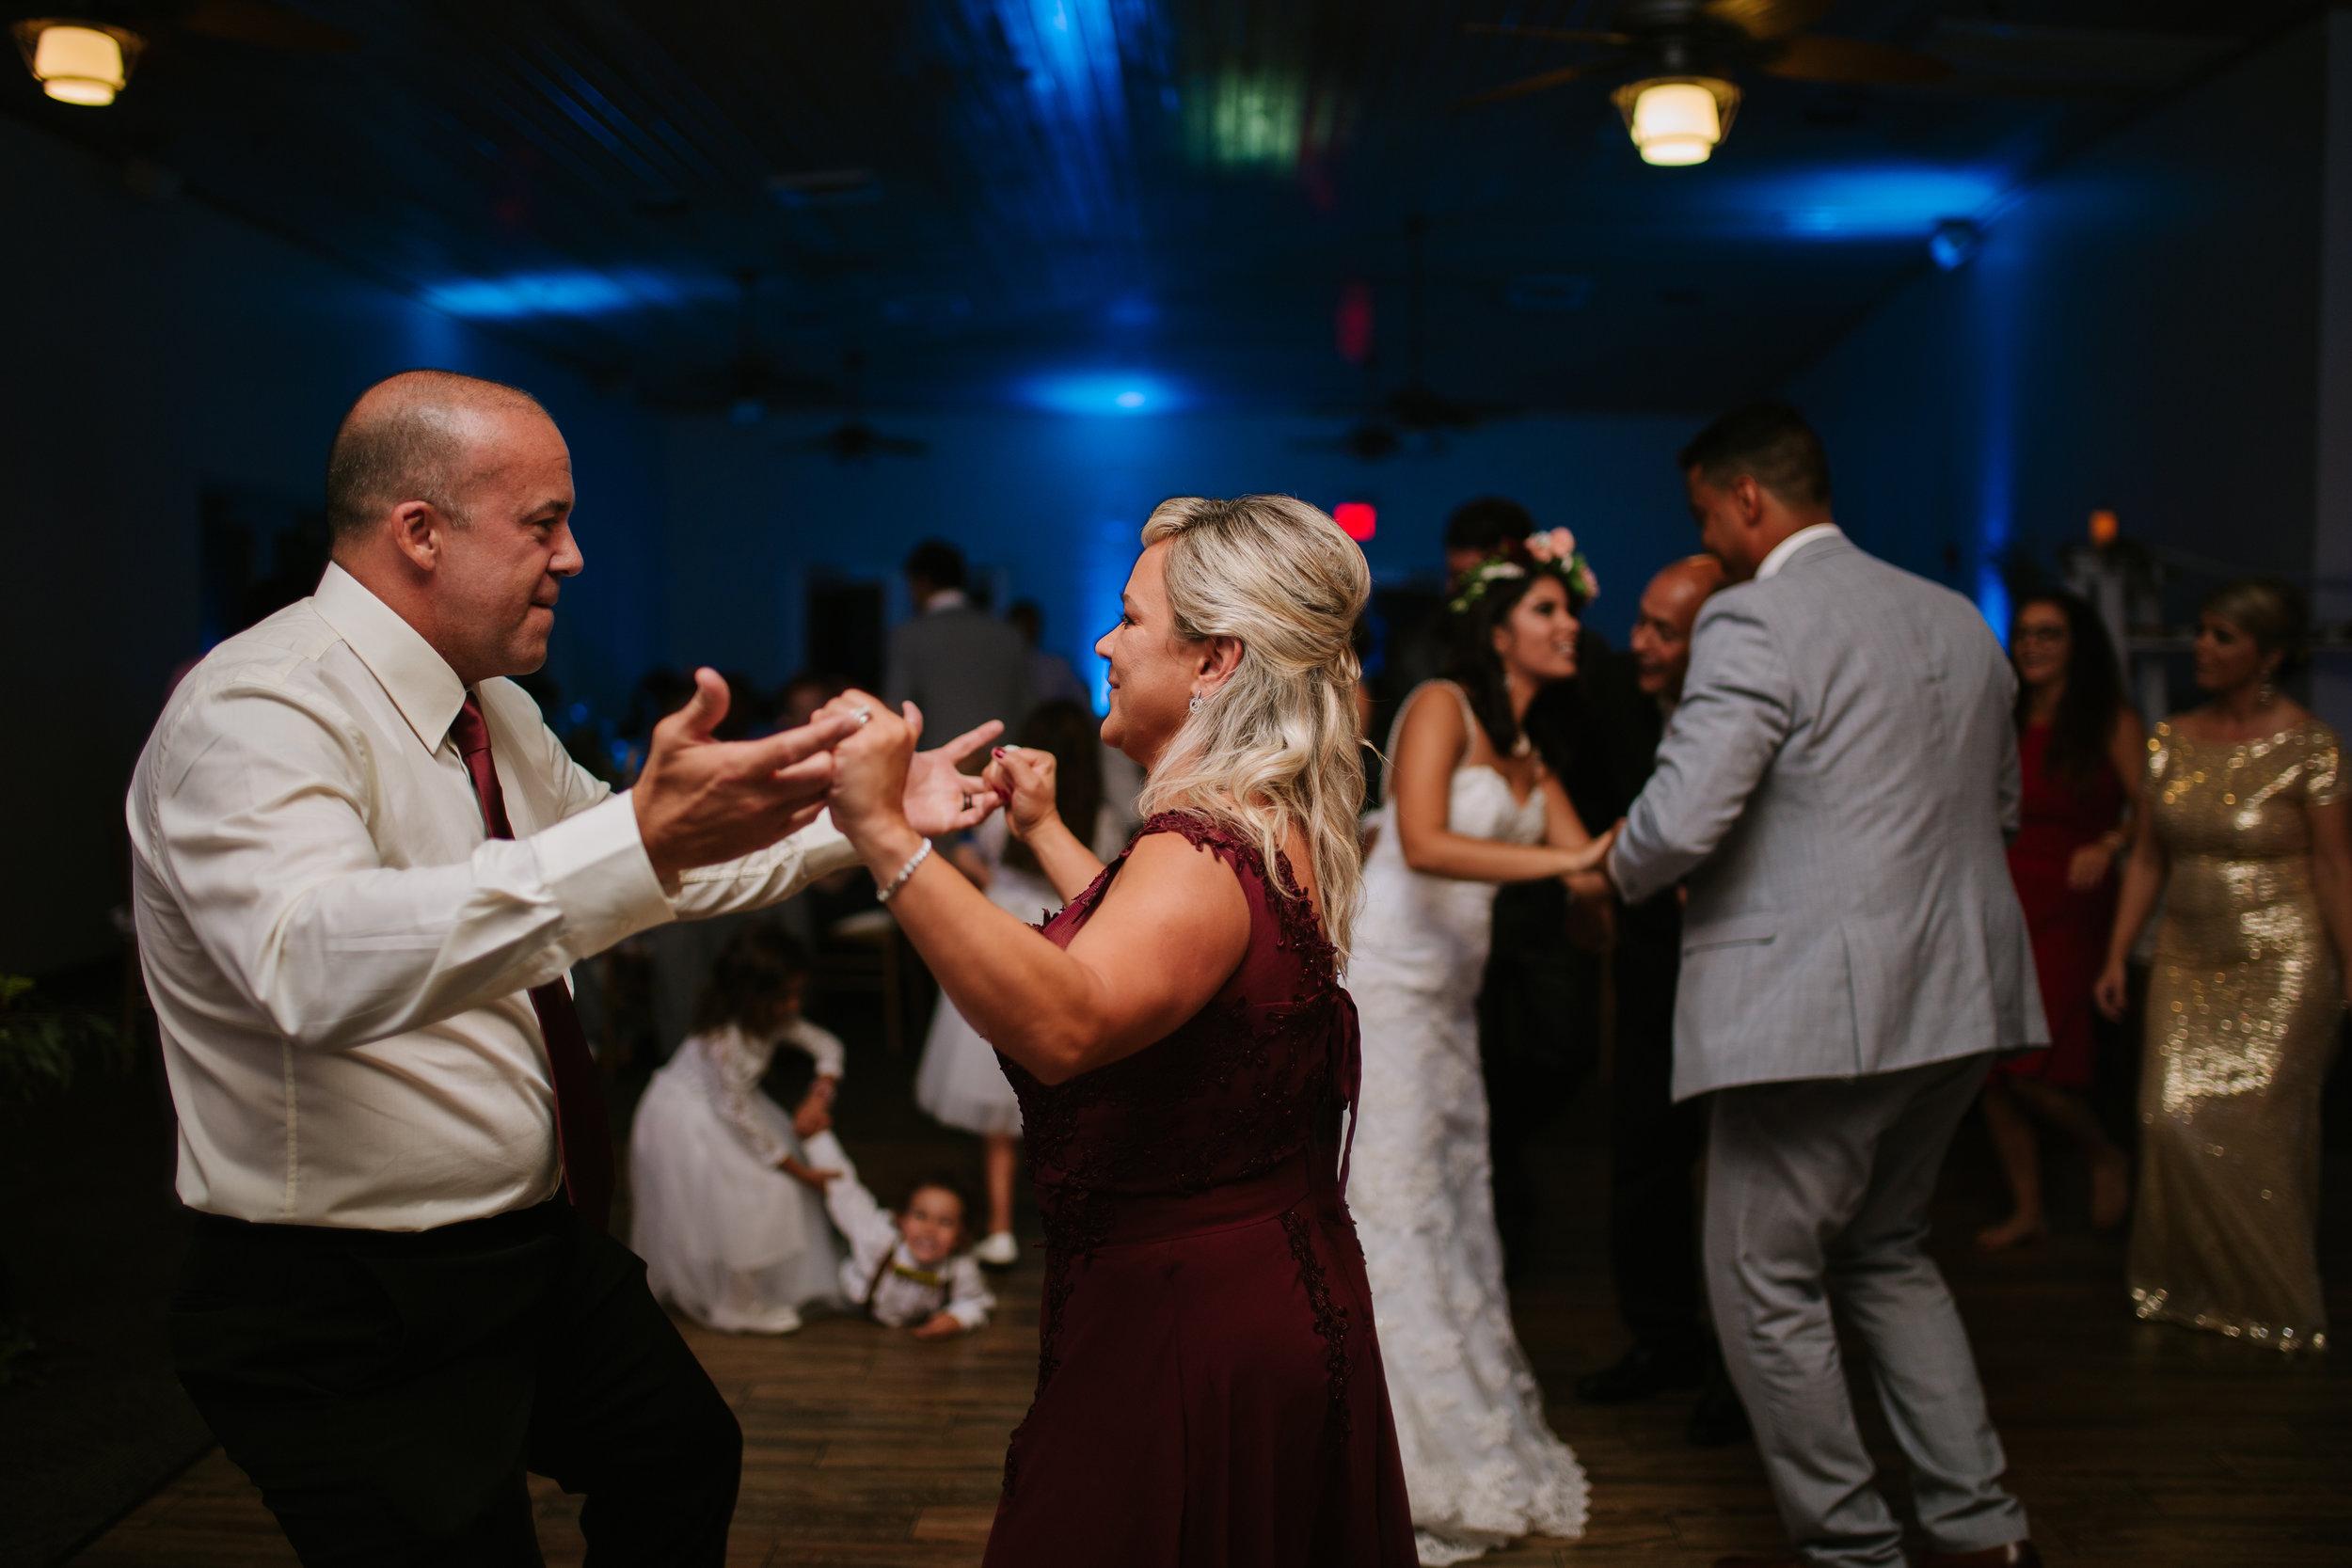 2017.05.23 Barbara and Mauricio Sales Port St Lucie Wedding (696 of 772).jpg